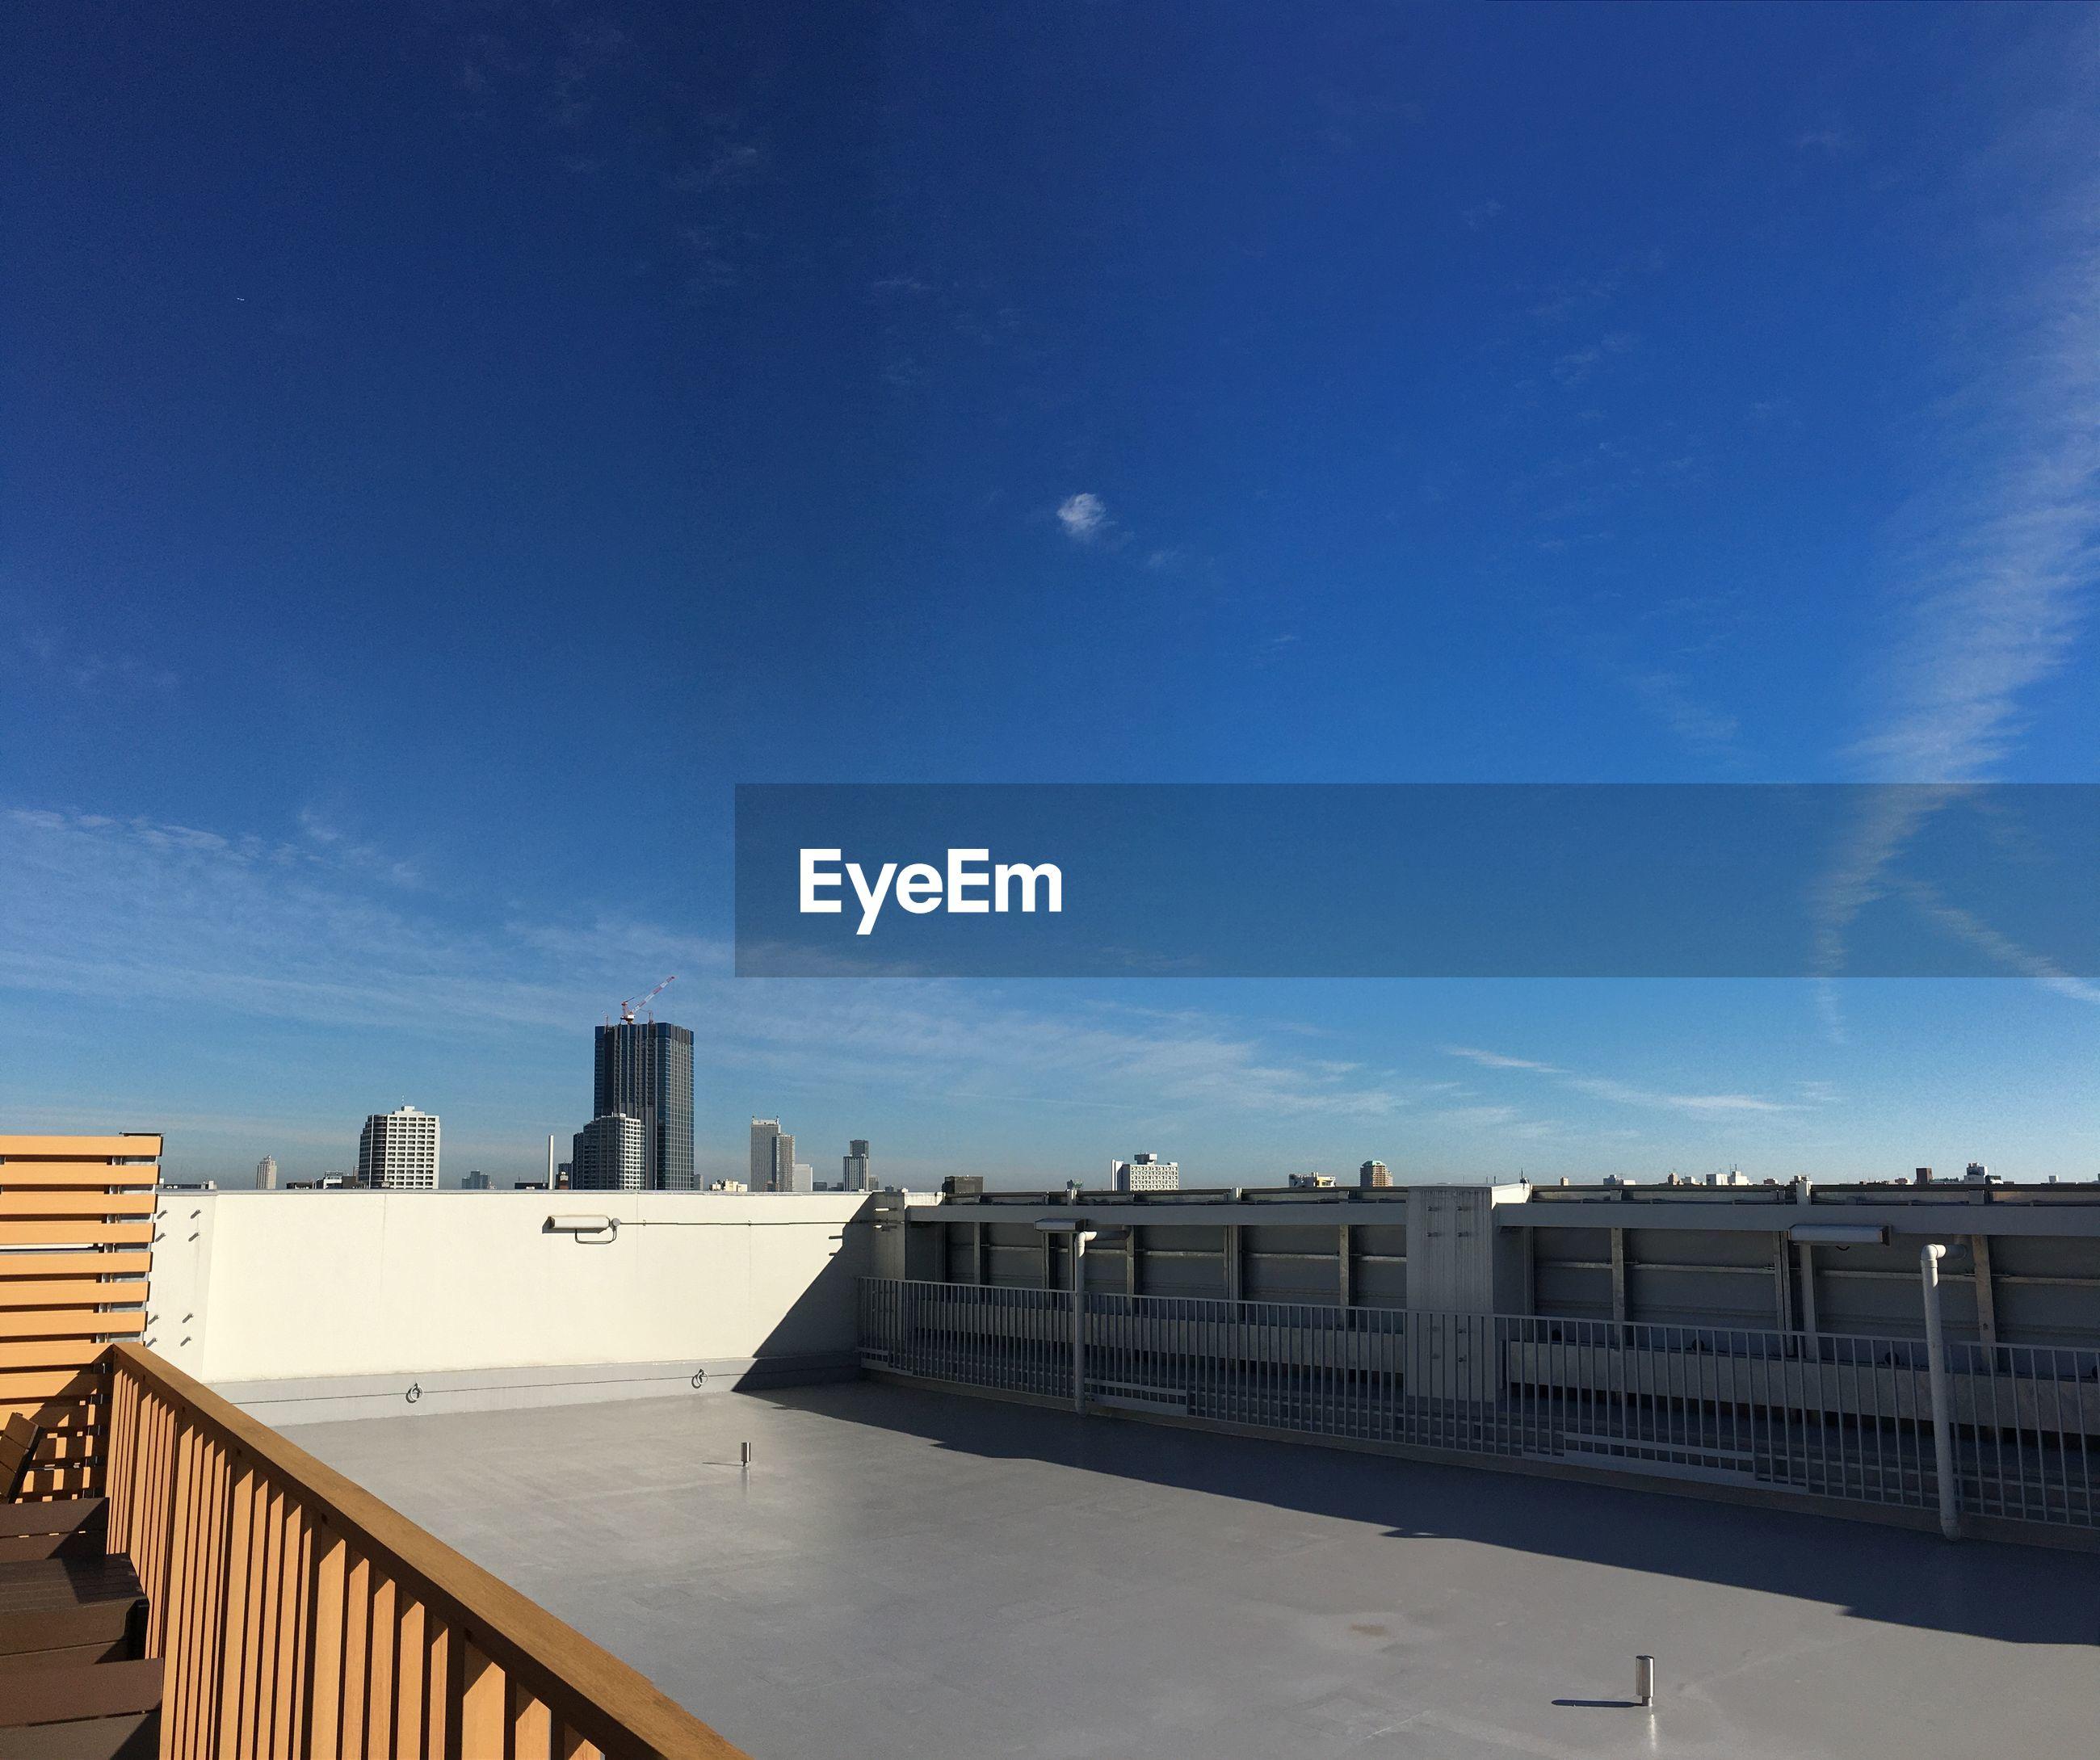 Building terrace in city against blue sky